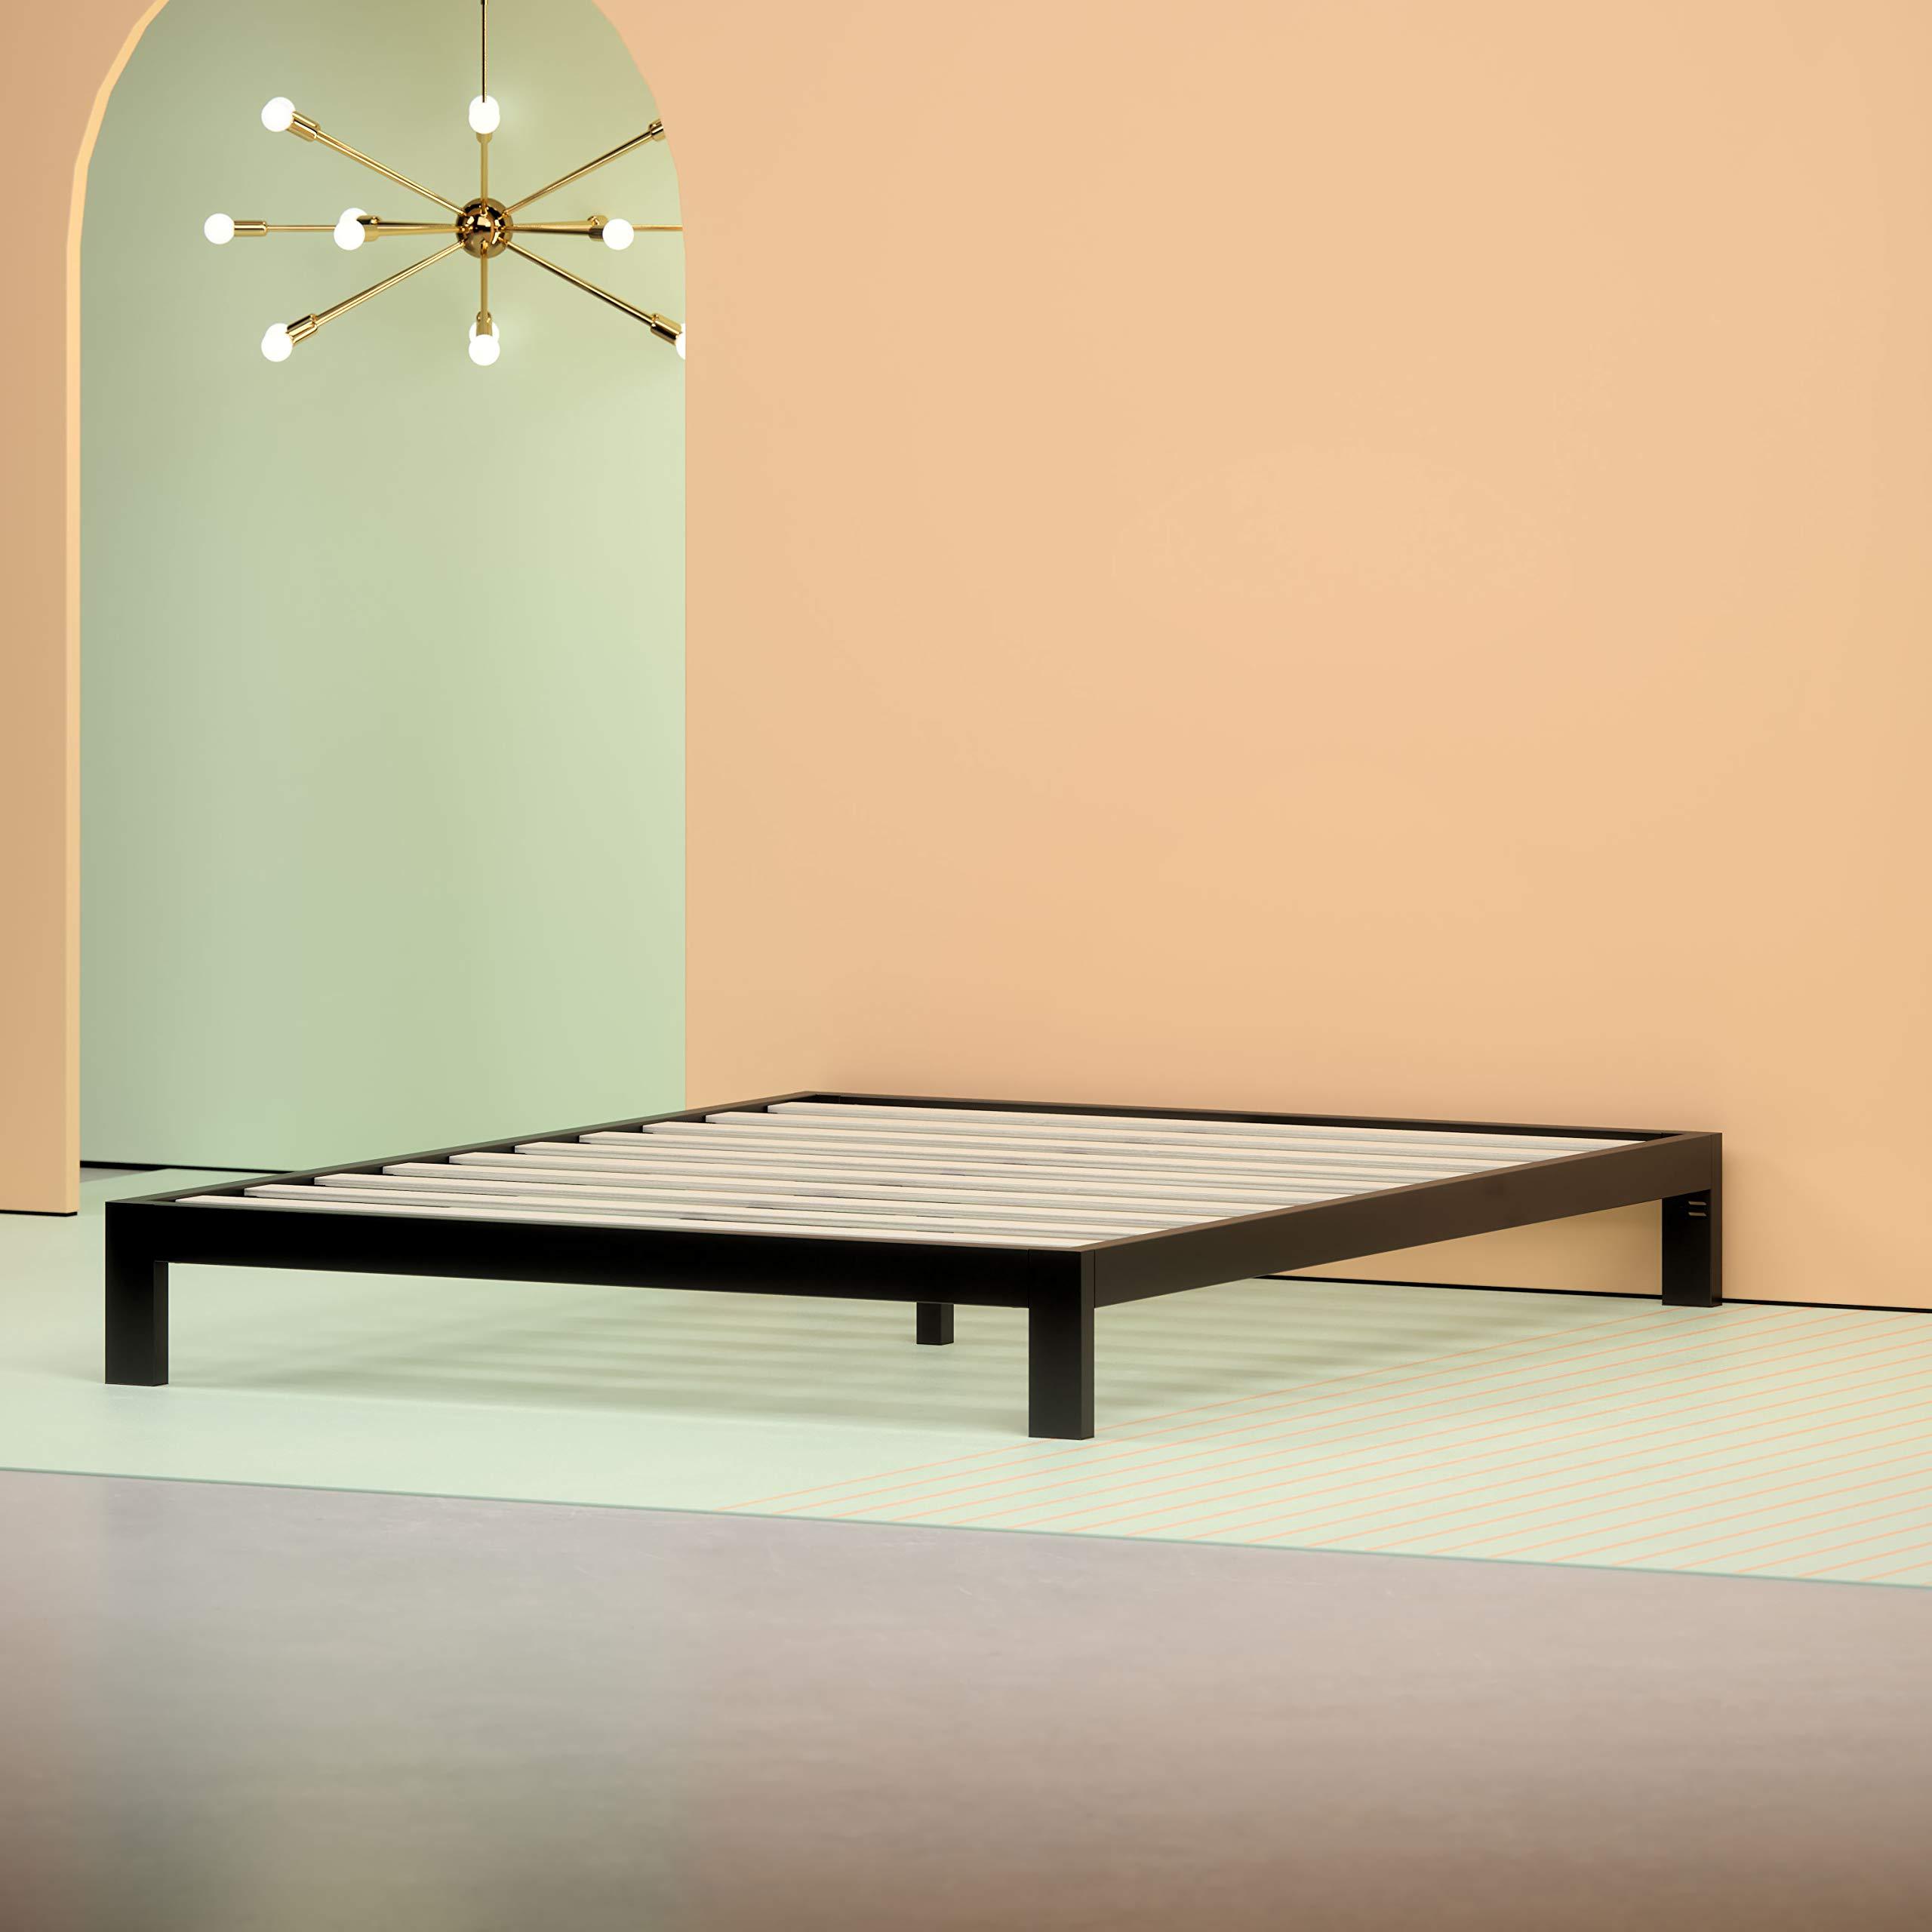 Zinus Arnav Modern Studio 10 Inch Platform 2000 Metal Bed Frame / Mattress Foundation / No Box Spring Needed / Wooden Slat Support / Good Design Award Winner, Full